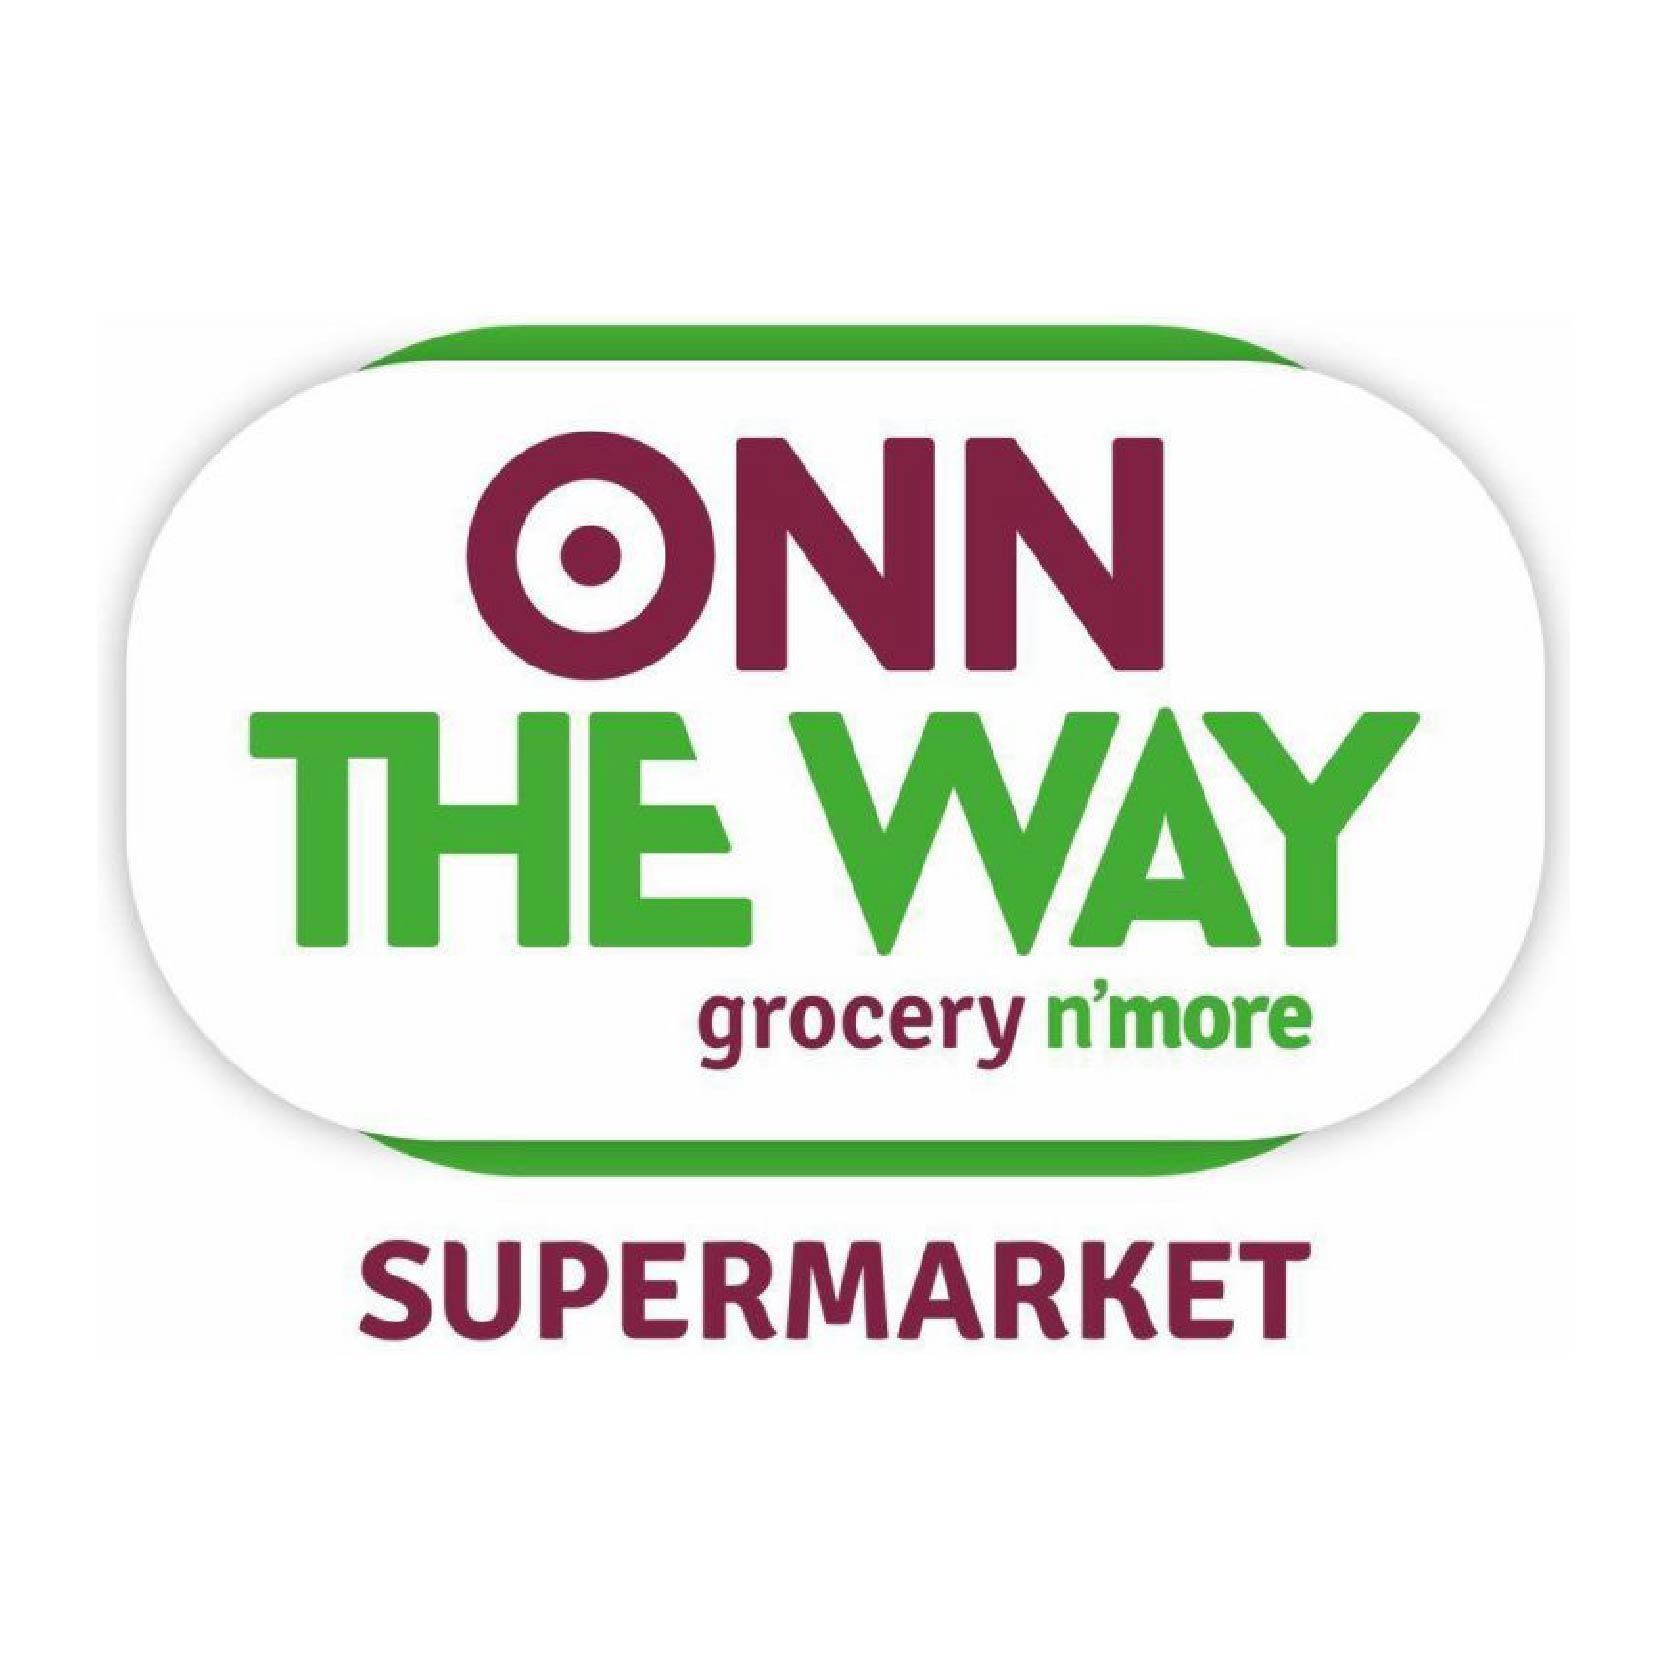 On The Way Supermarket